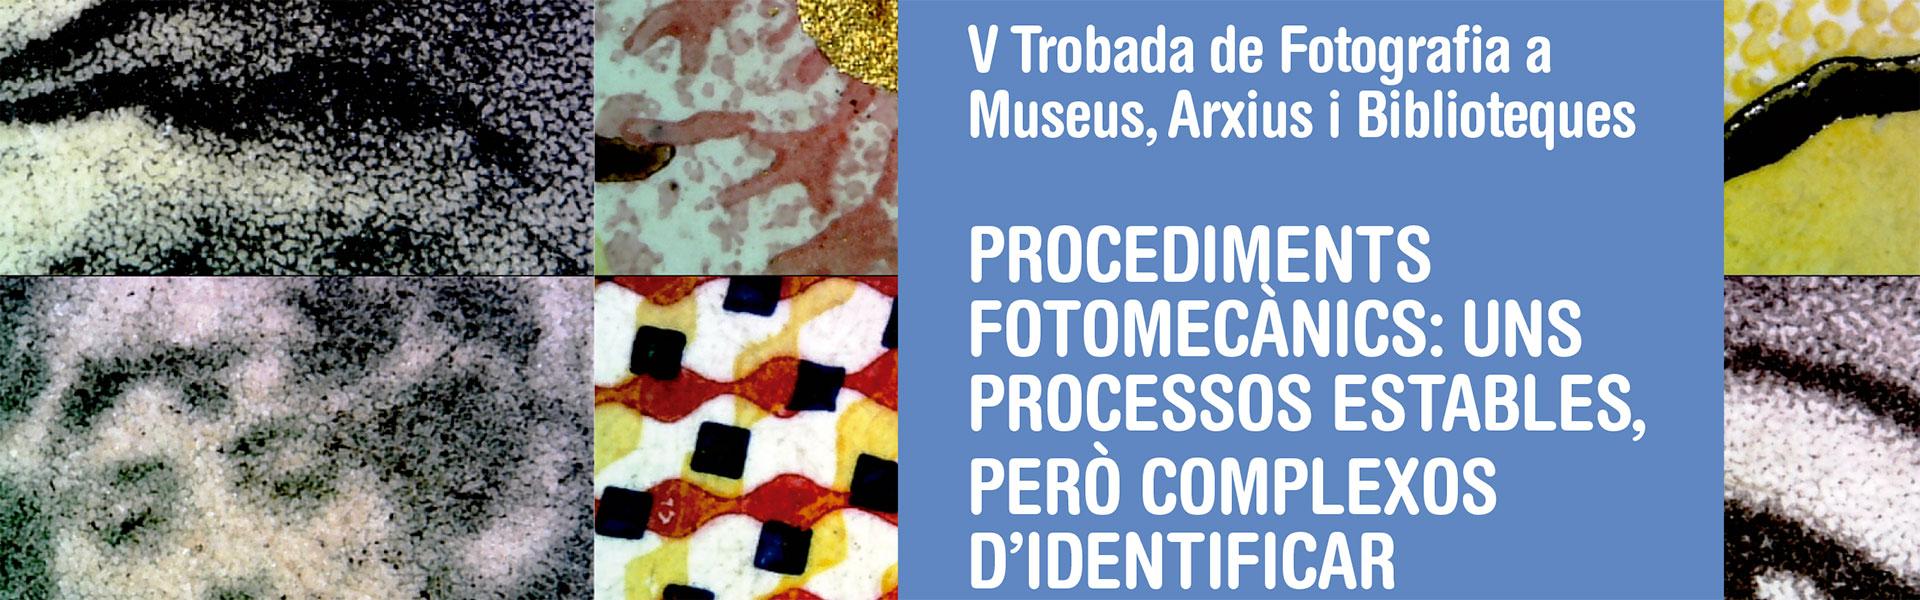 V Trobada de Fotografia a Museus, Arxius i Biblioteques